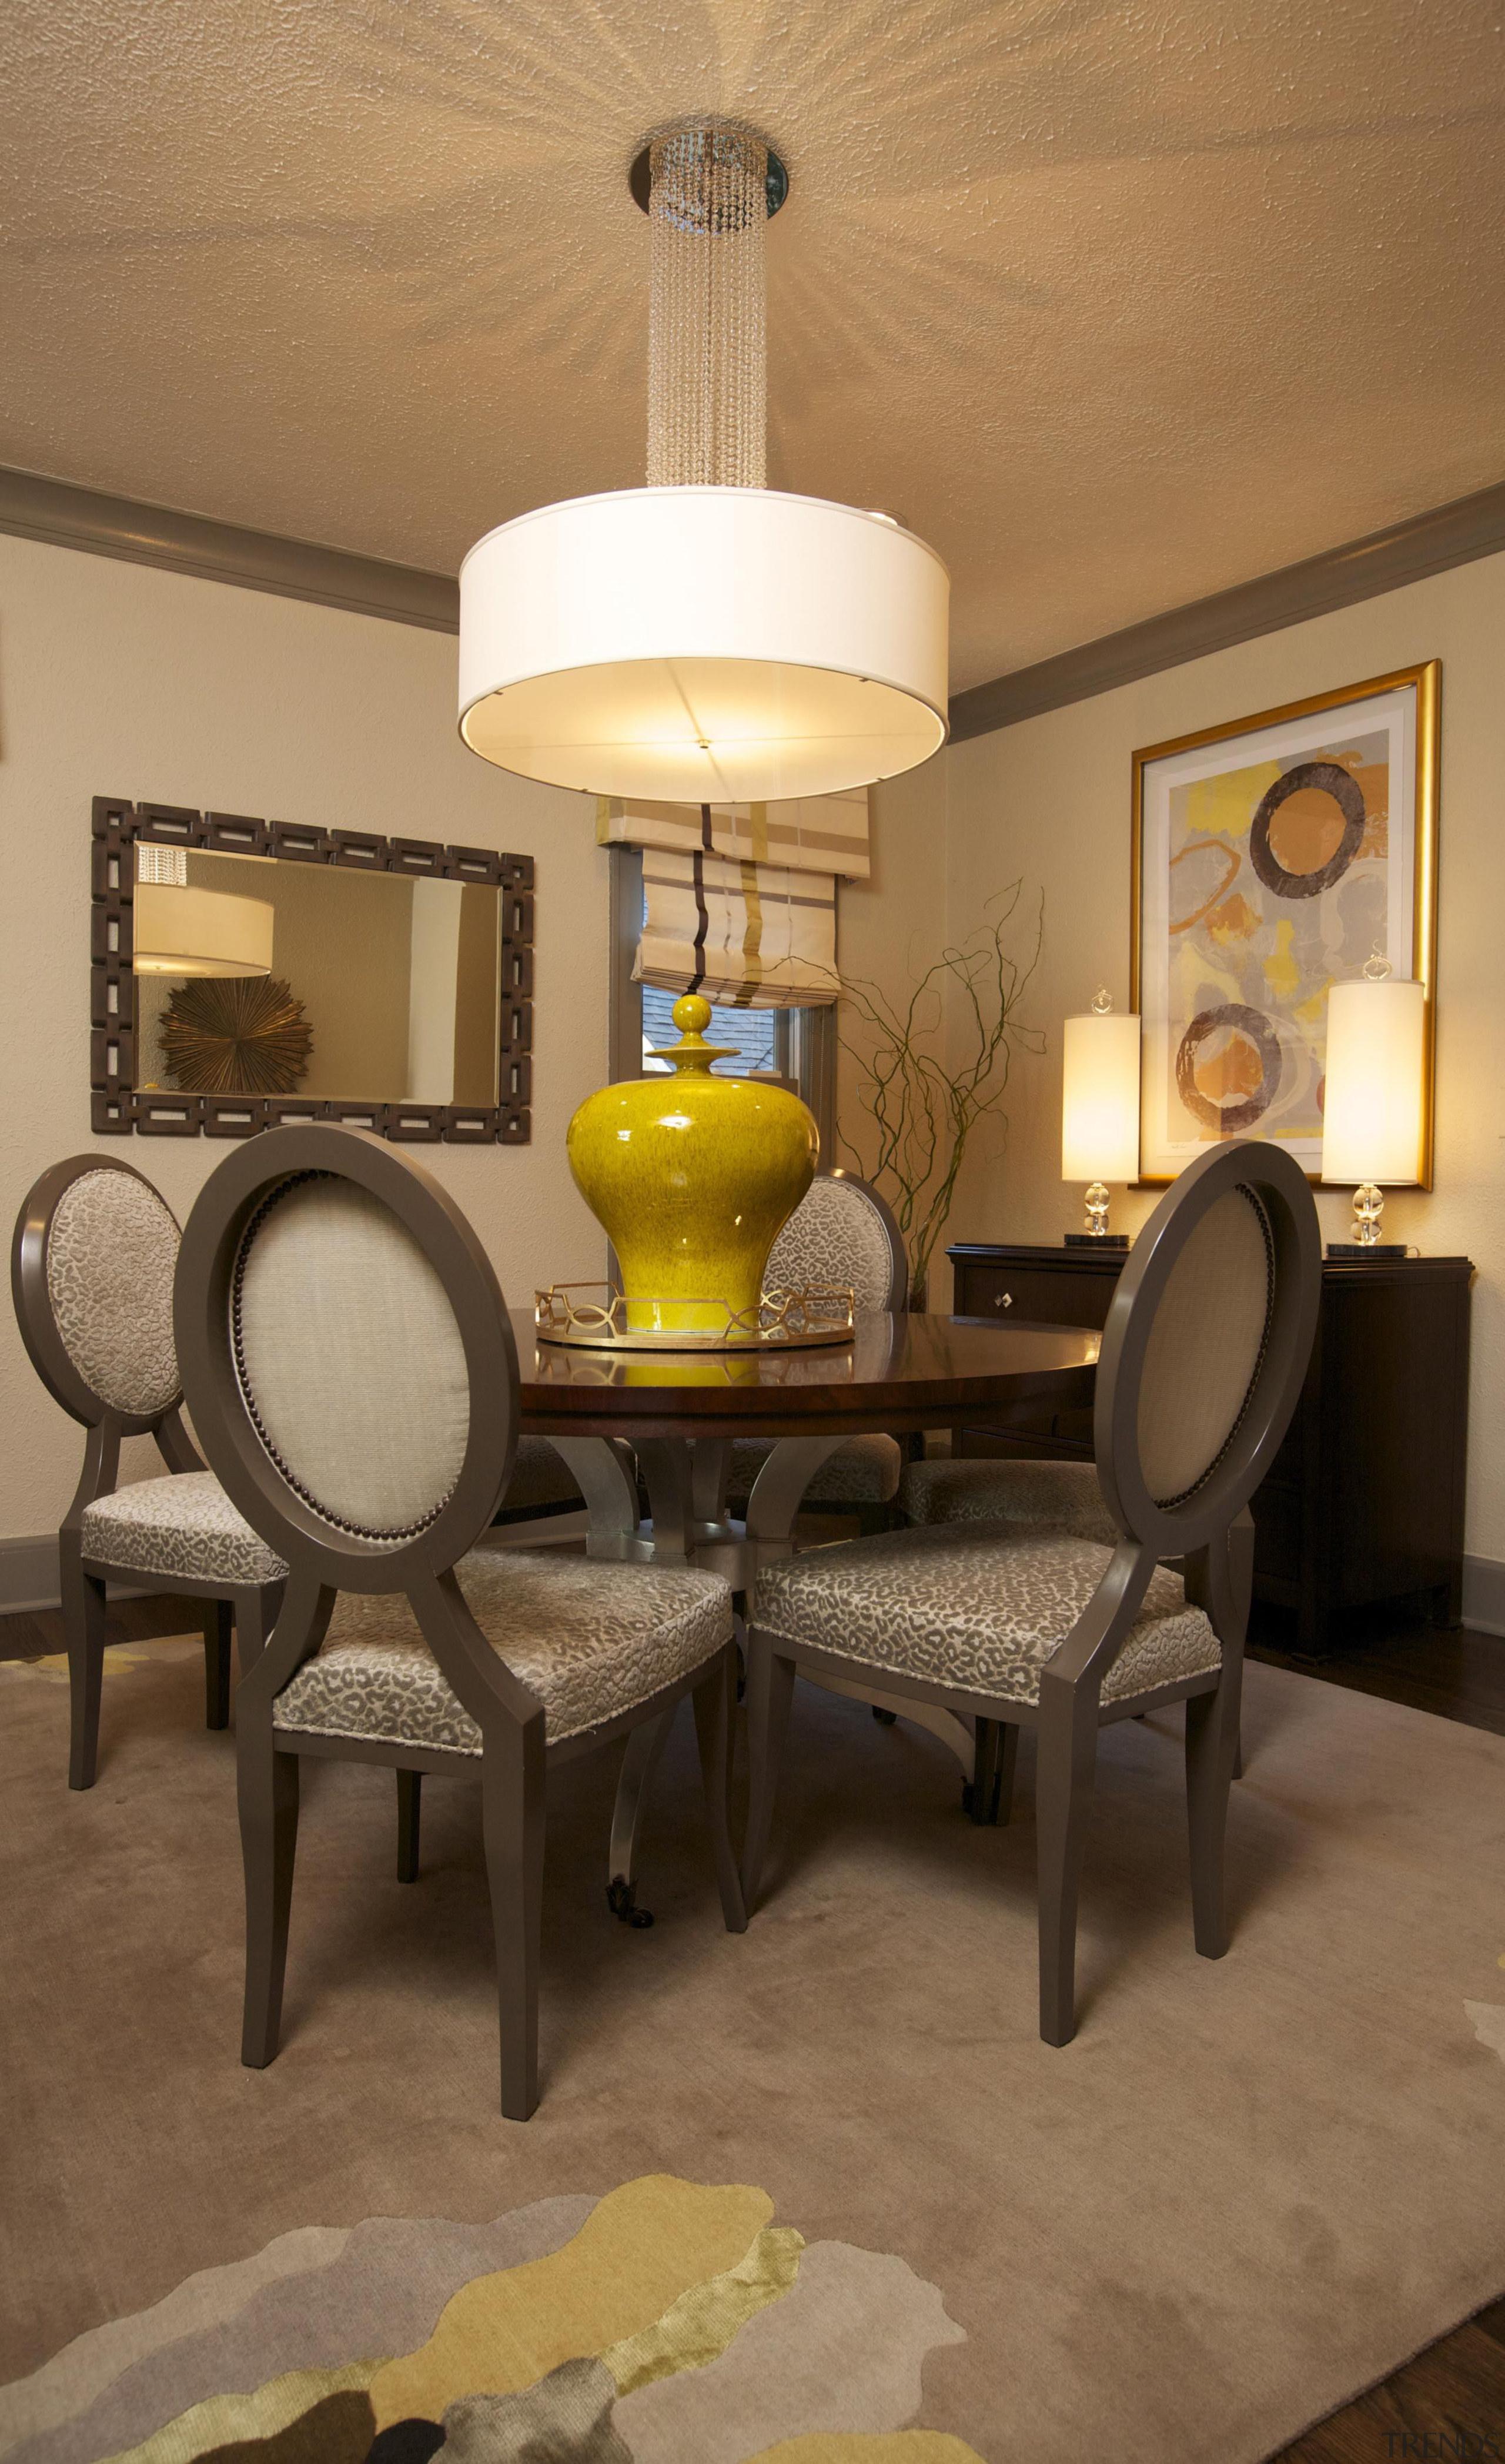 lange ct dining6338removedseaminlamo.jpg - lange_ct_dining6338removedseaminlamo.jpg - ceiling | ceiling, chair, chandelier, dining room, furniture, home, interior design, light fixture, lighting, living room, room, table, brown